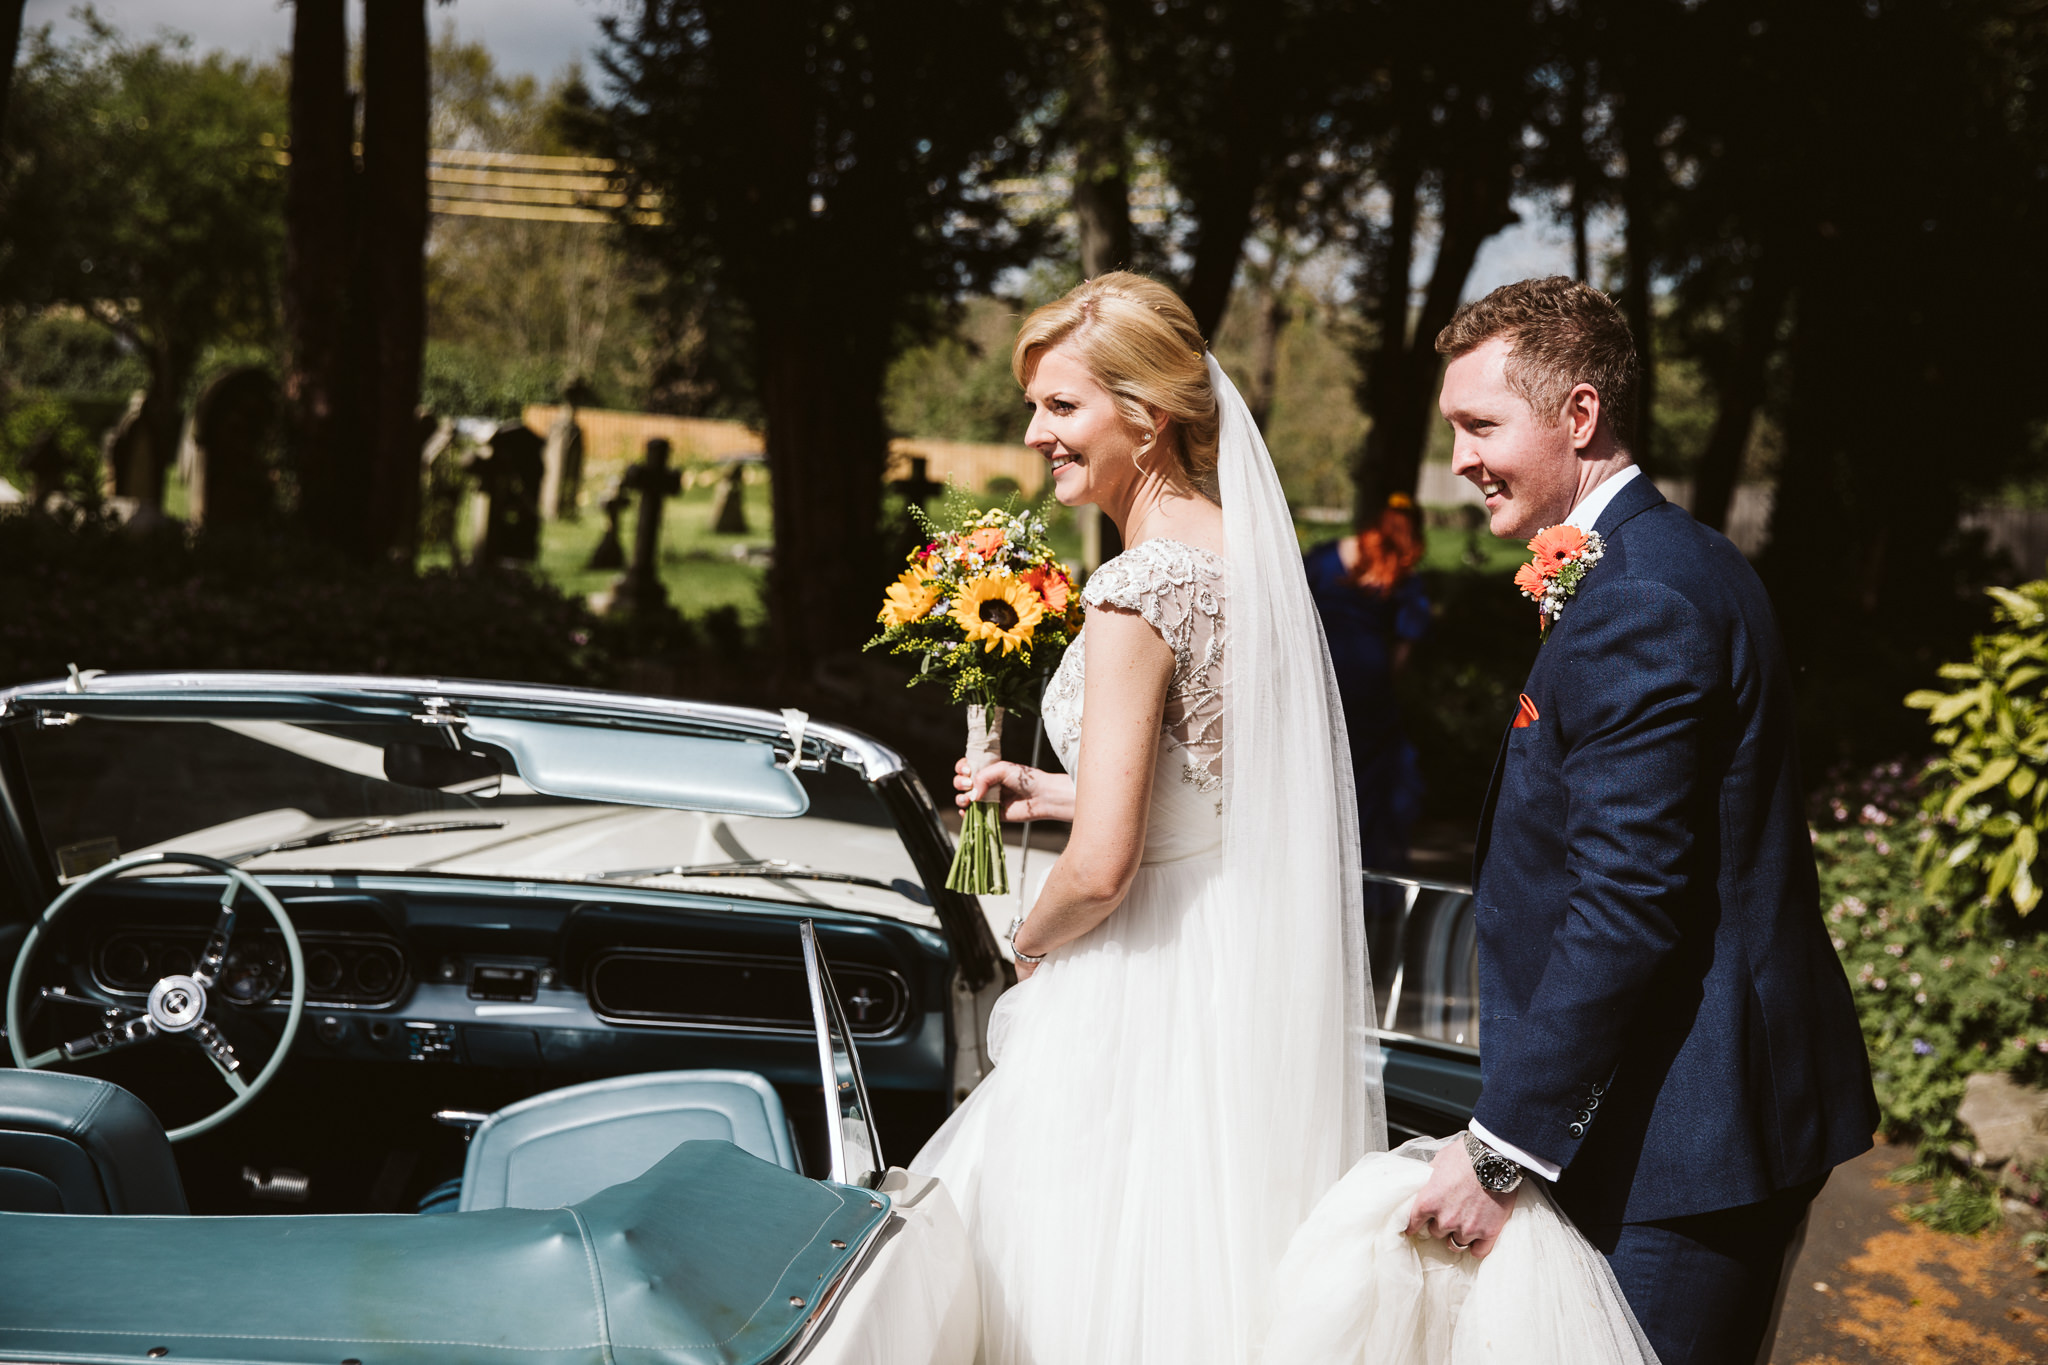 northside-farm-wedding-northumberland-margarita-hope (39).jpg